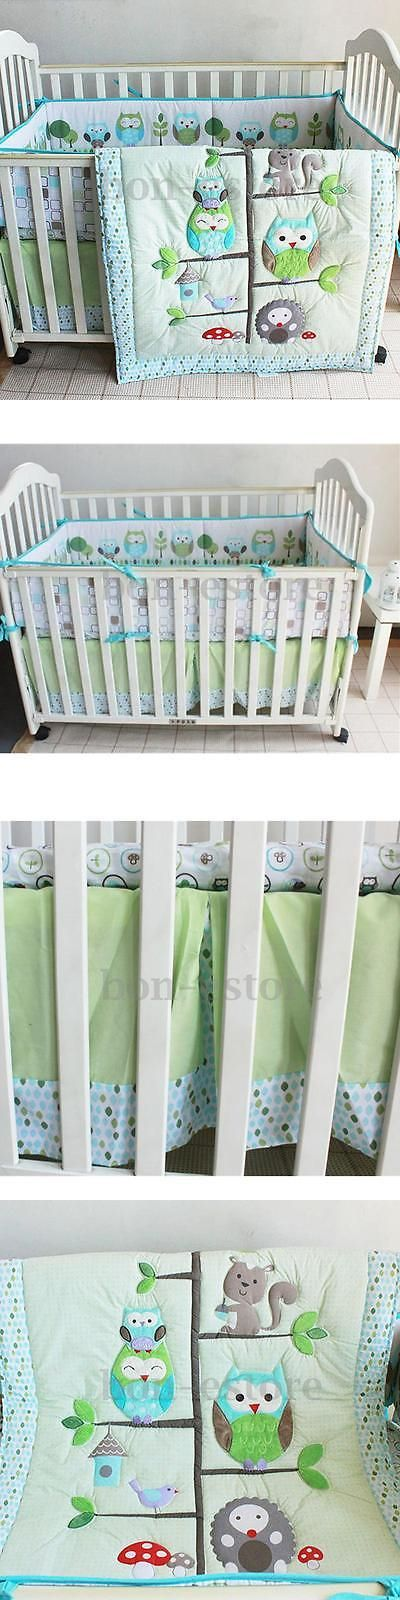 Nursery Bedding Sets 162040: 7Pcs Baby Bedding Set Owl Family Nursery Quilt Bumper Sheet Soft Crib Skirt Us -> BUY IT NOW ONLY: $67.98 on eBay!